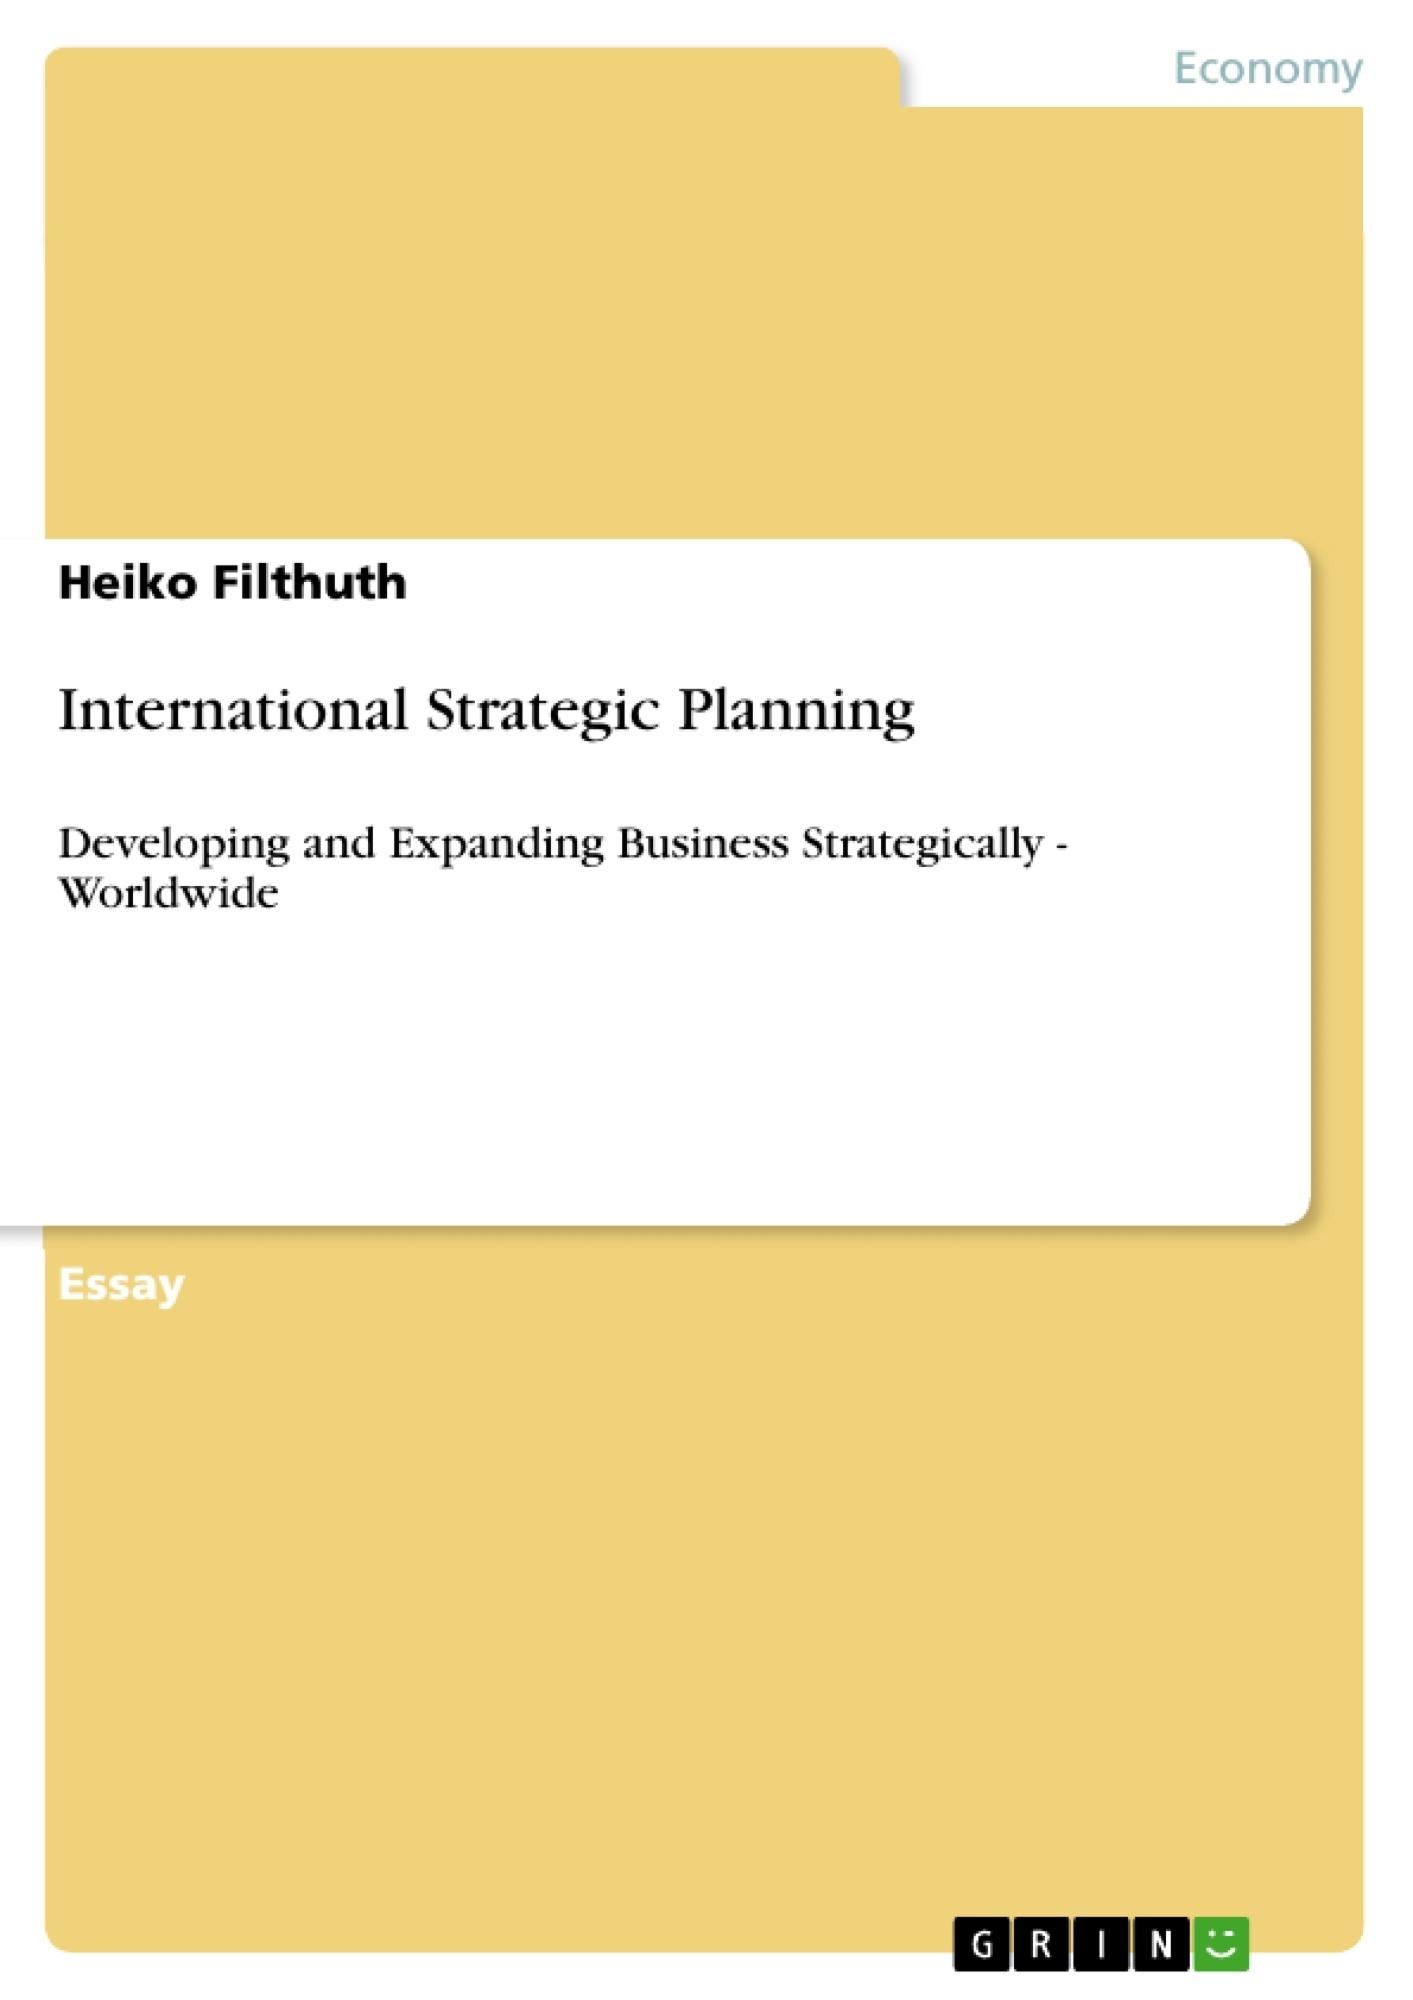 Title: International Strategic Planning